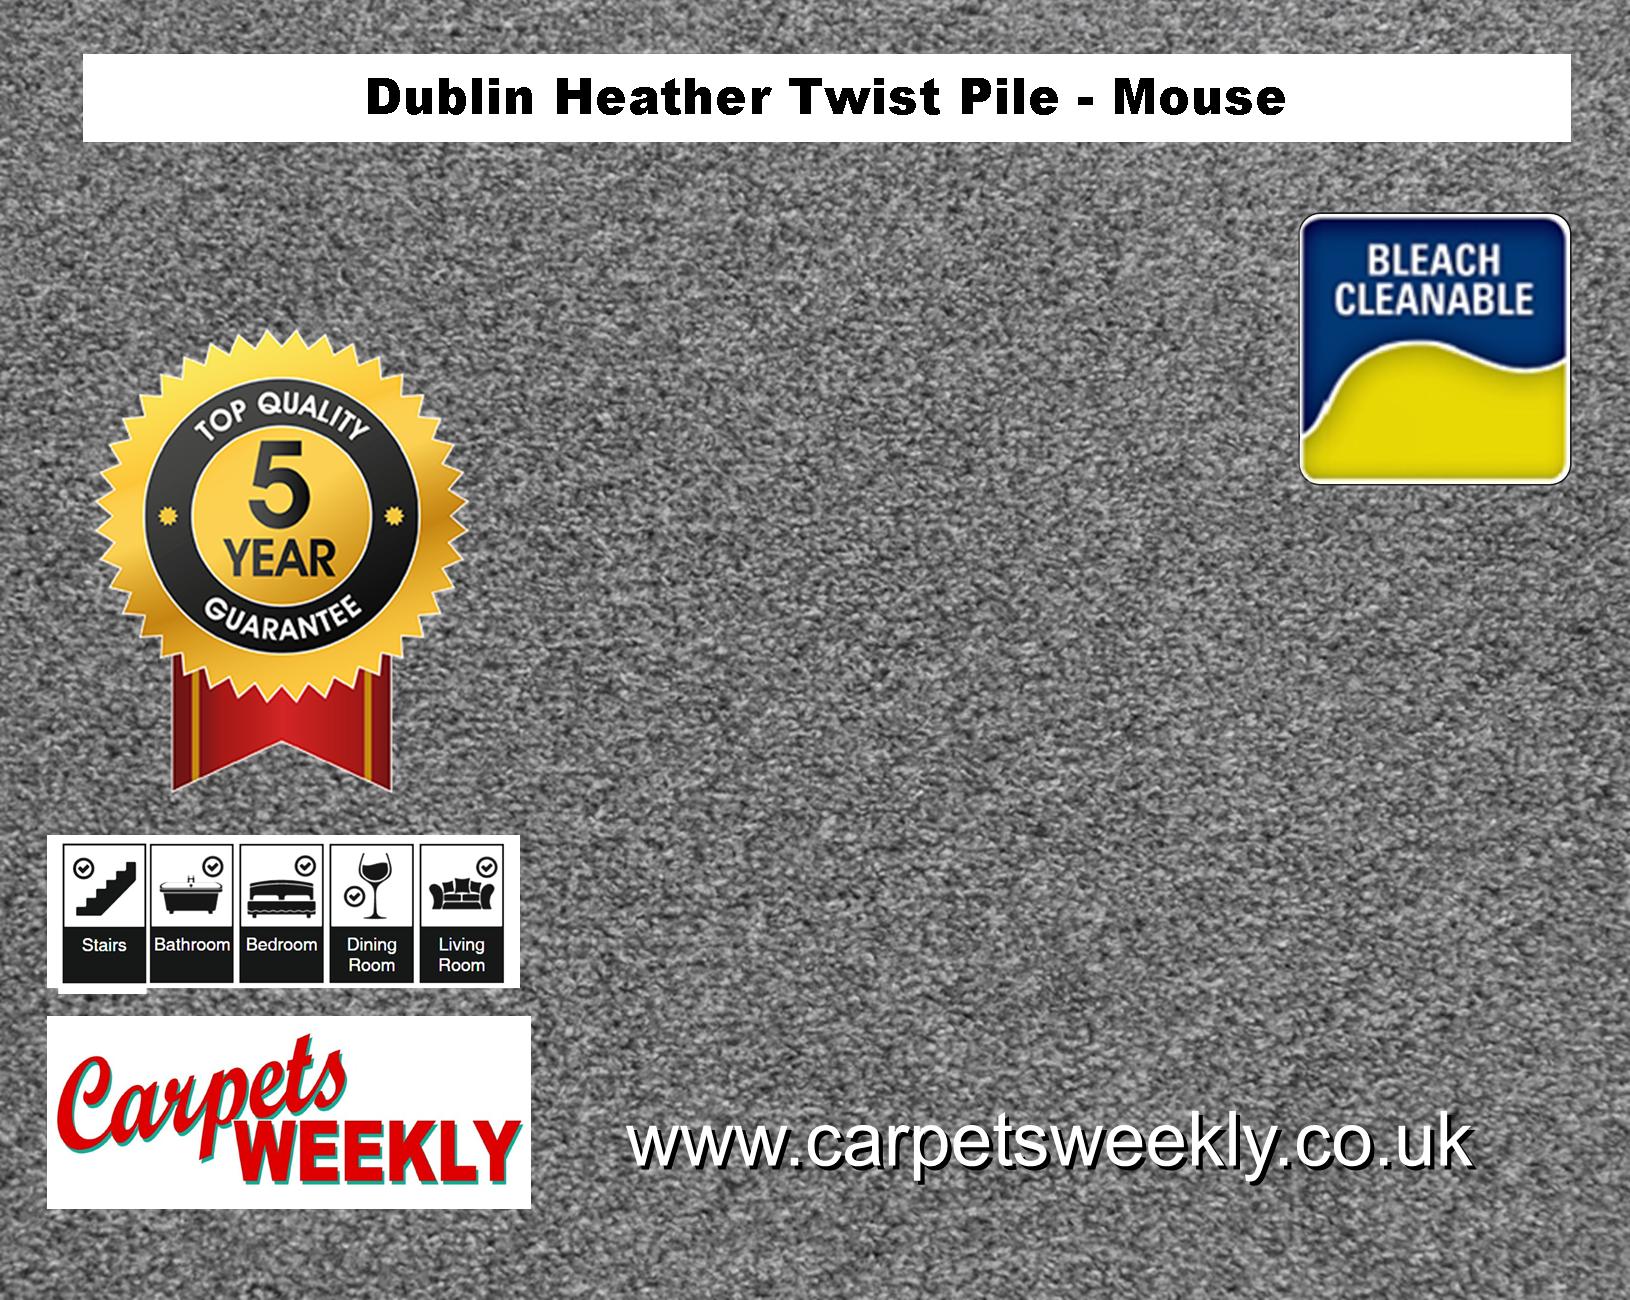 Carpets Weekly Dublin Heather Dublin Mouse - 151 mid range carpet